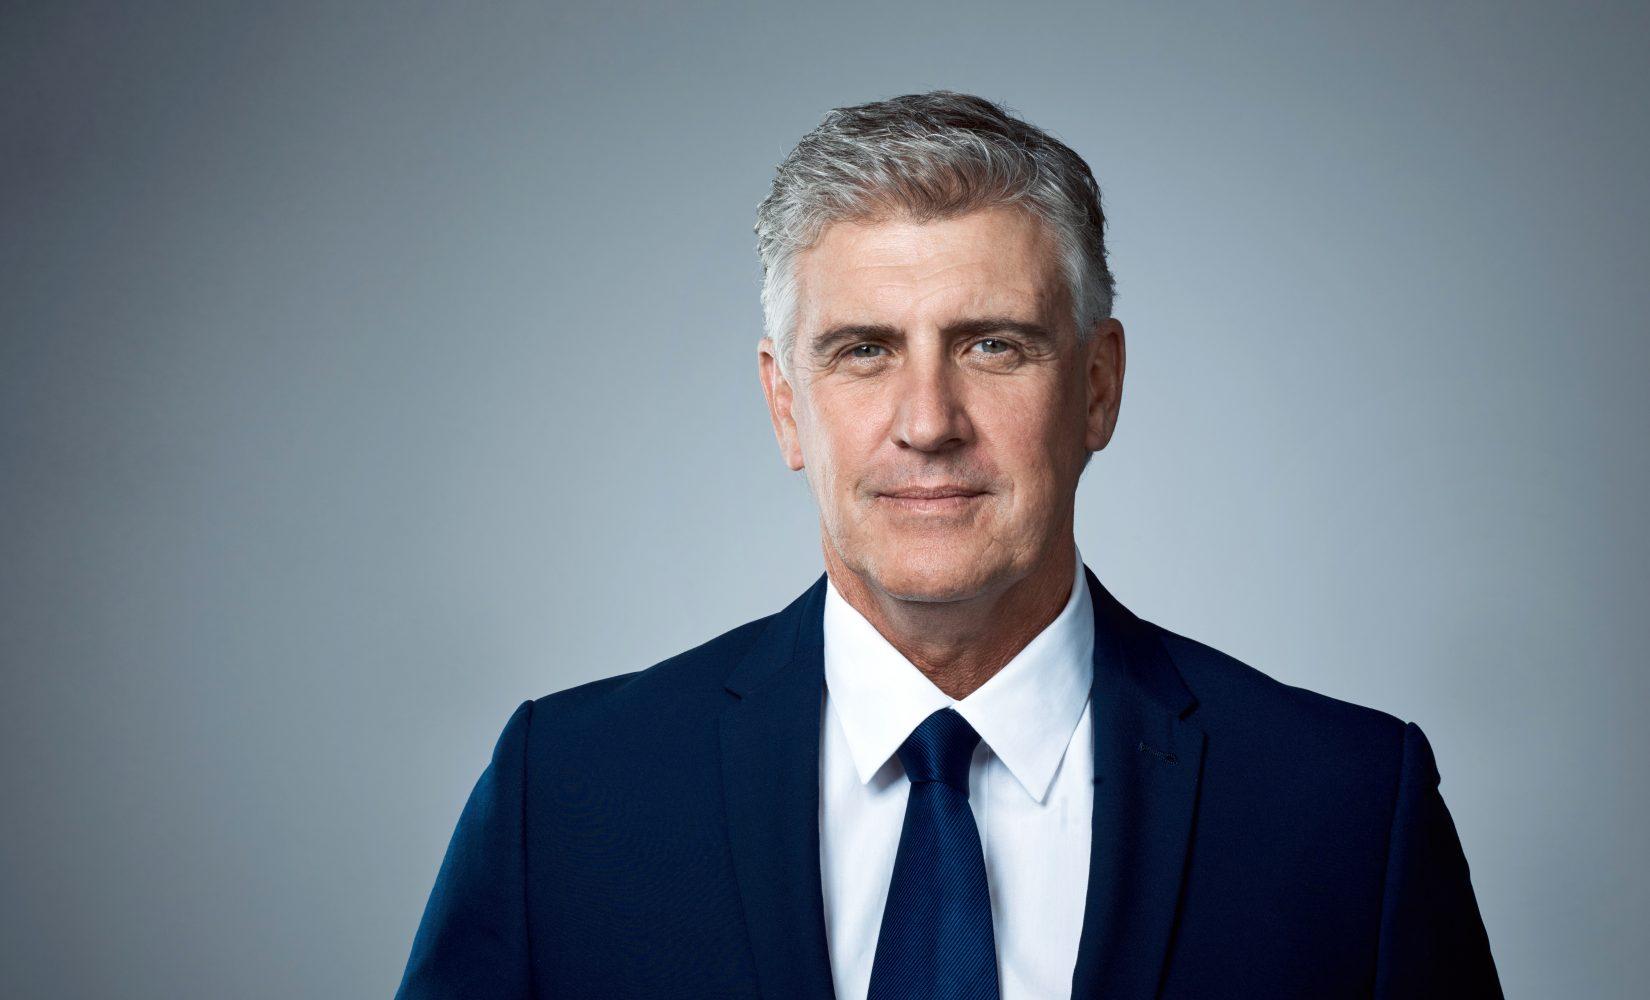 Studio portrait of a mature businessman posing against a grey background